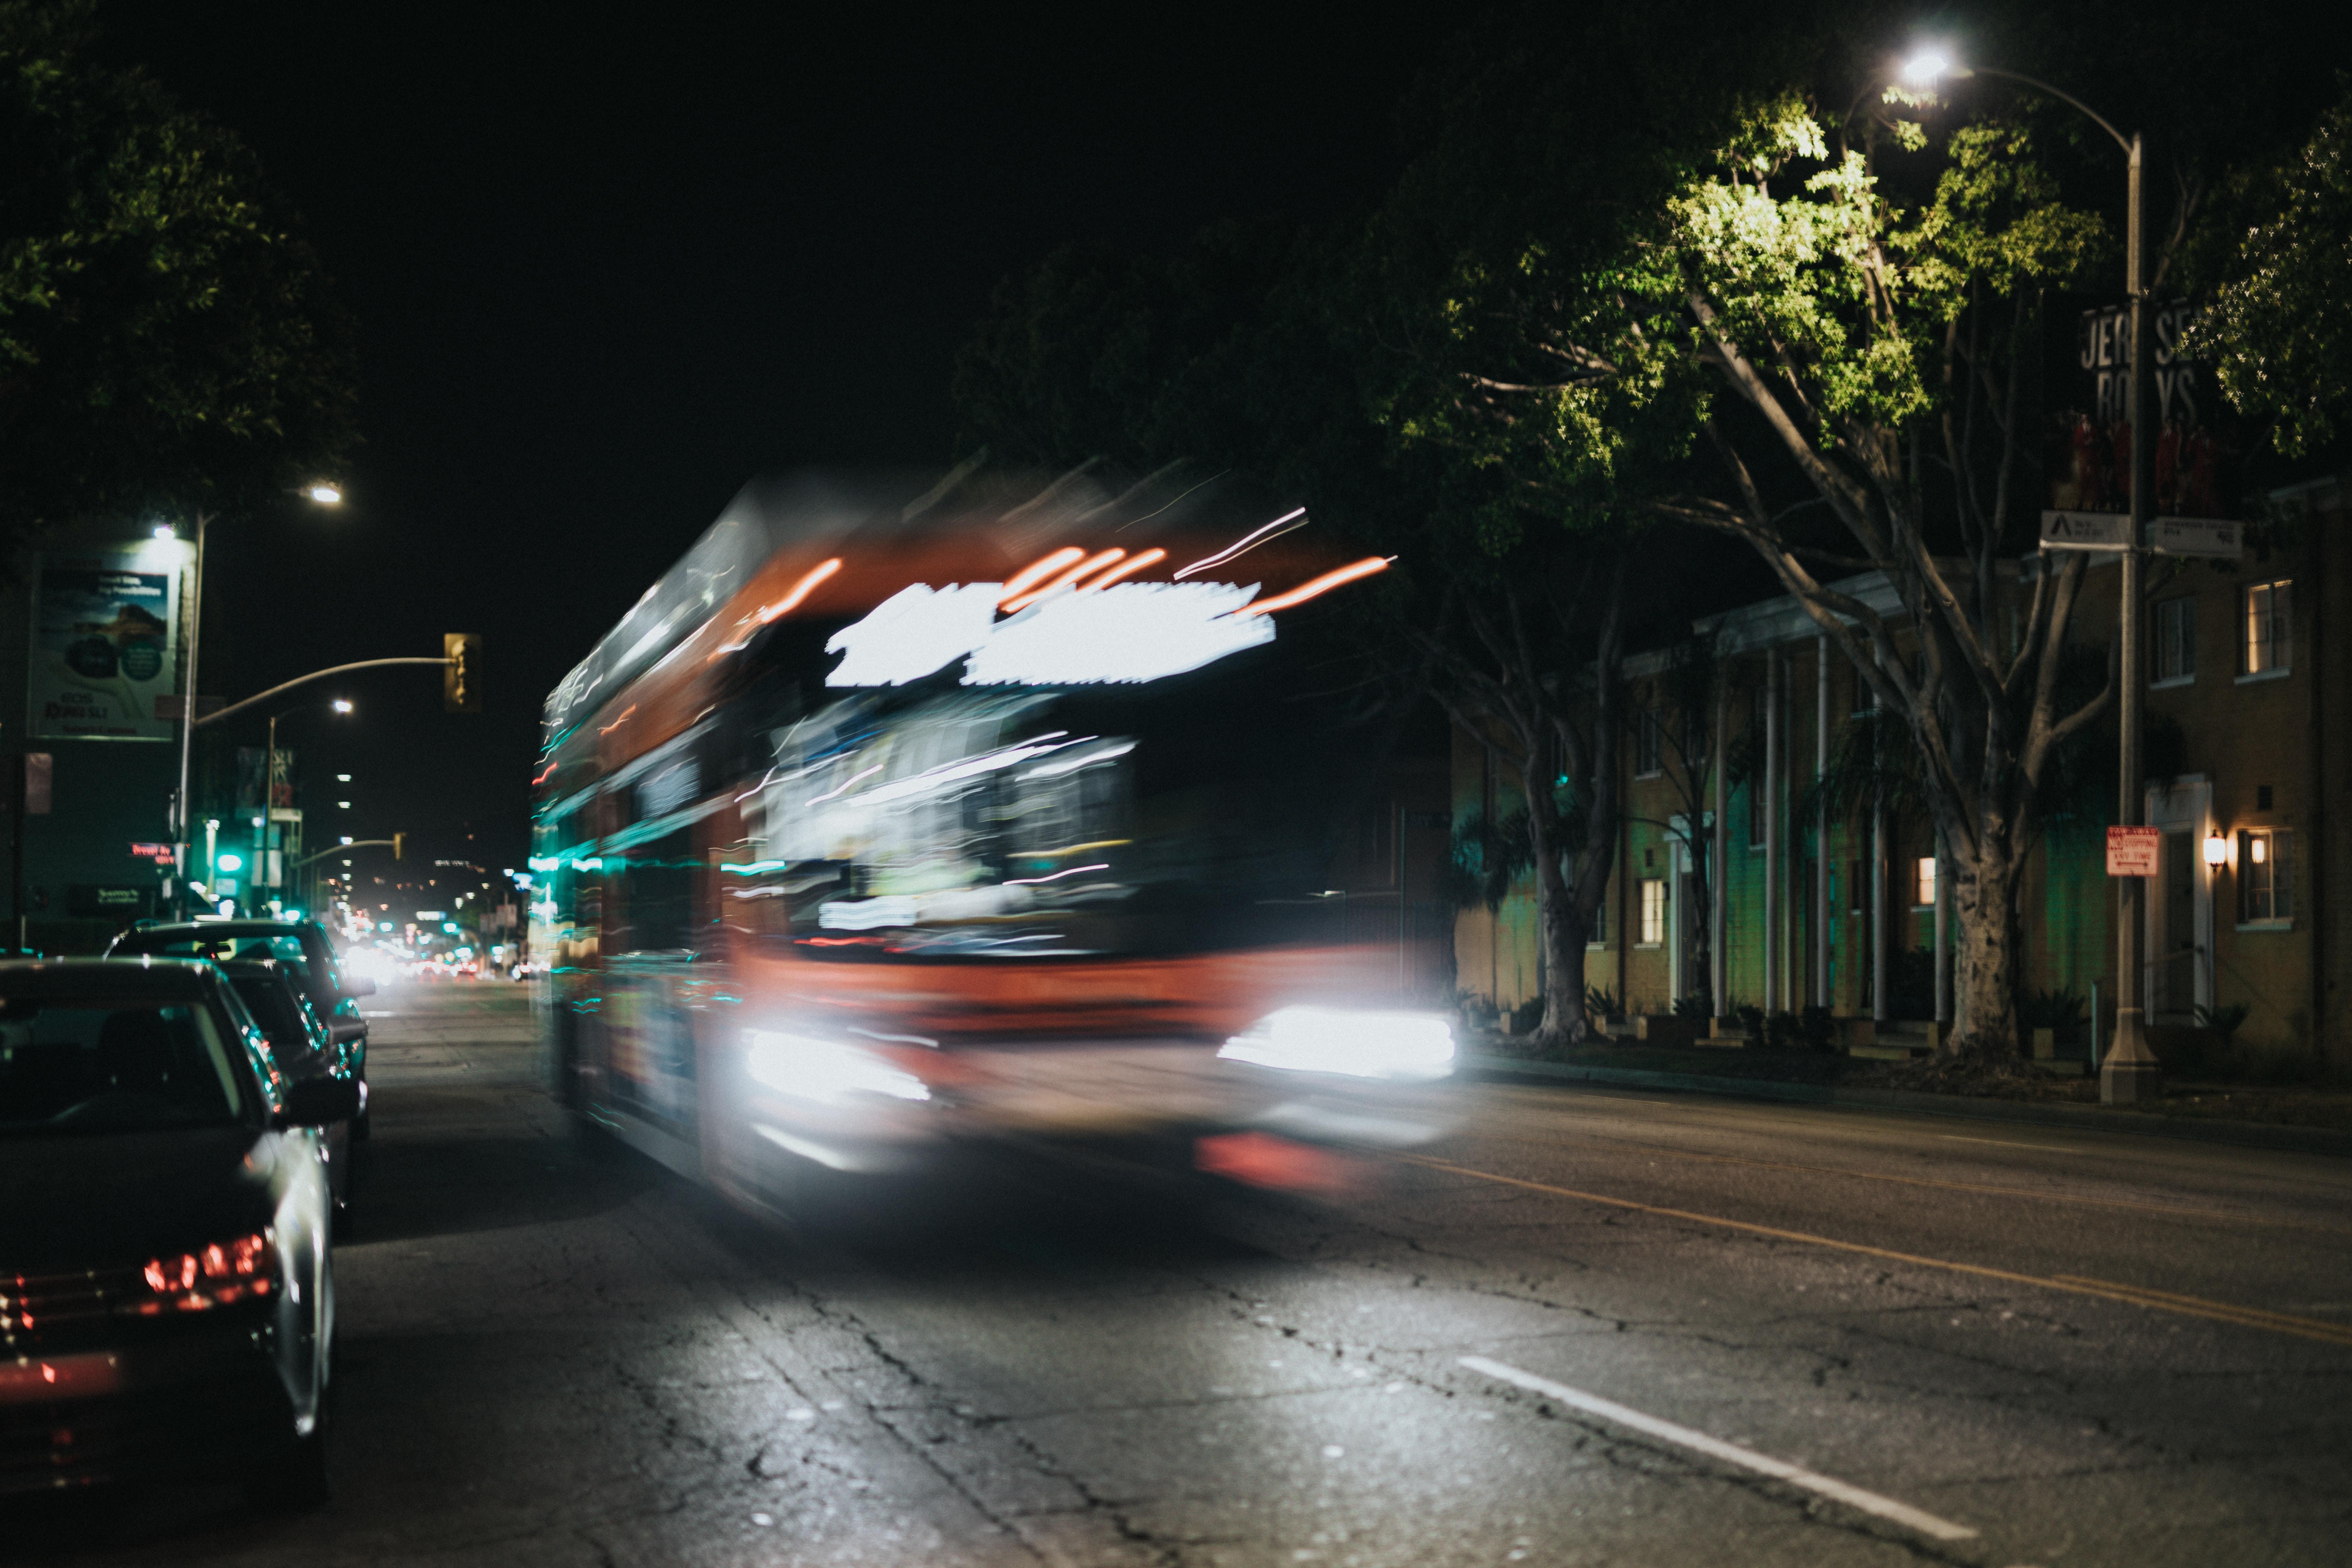 white bus passing through road